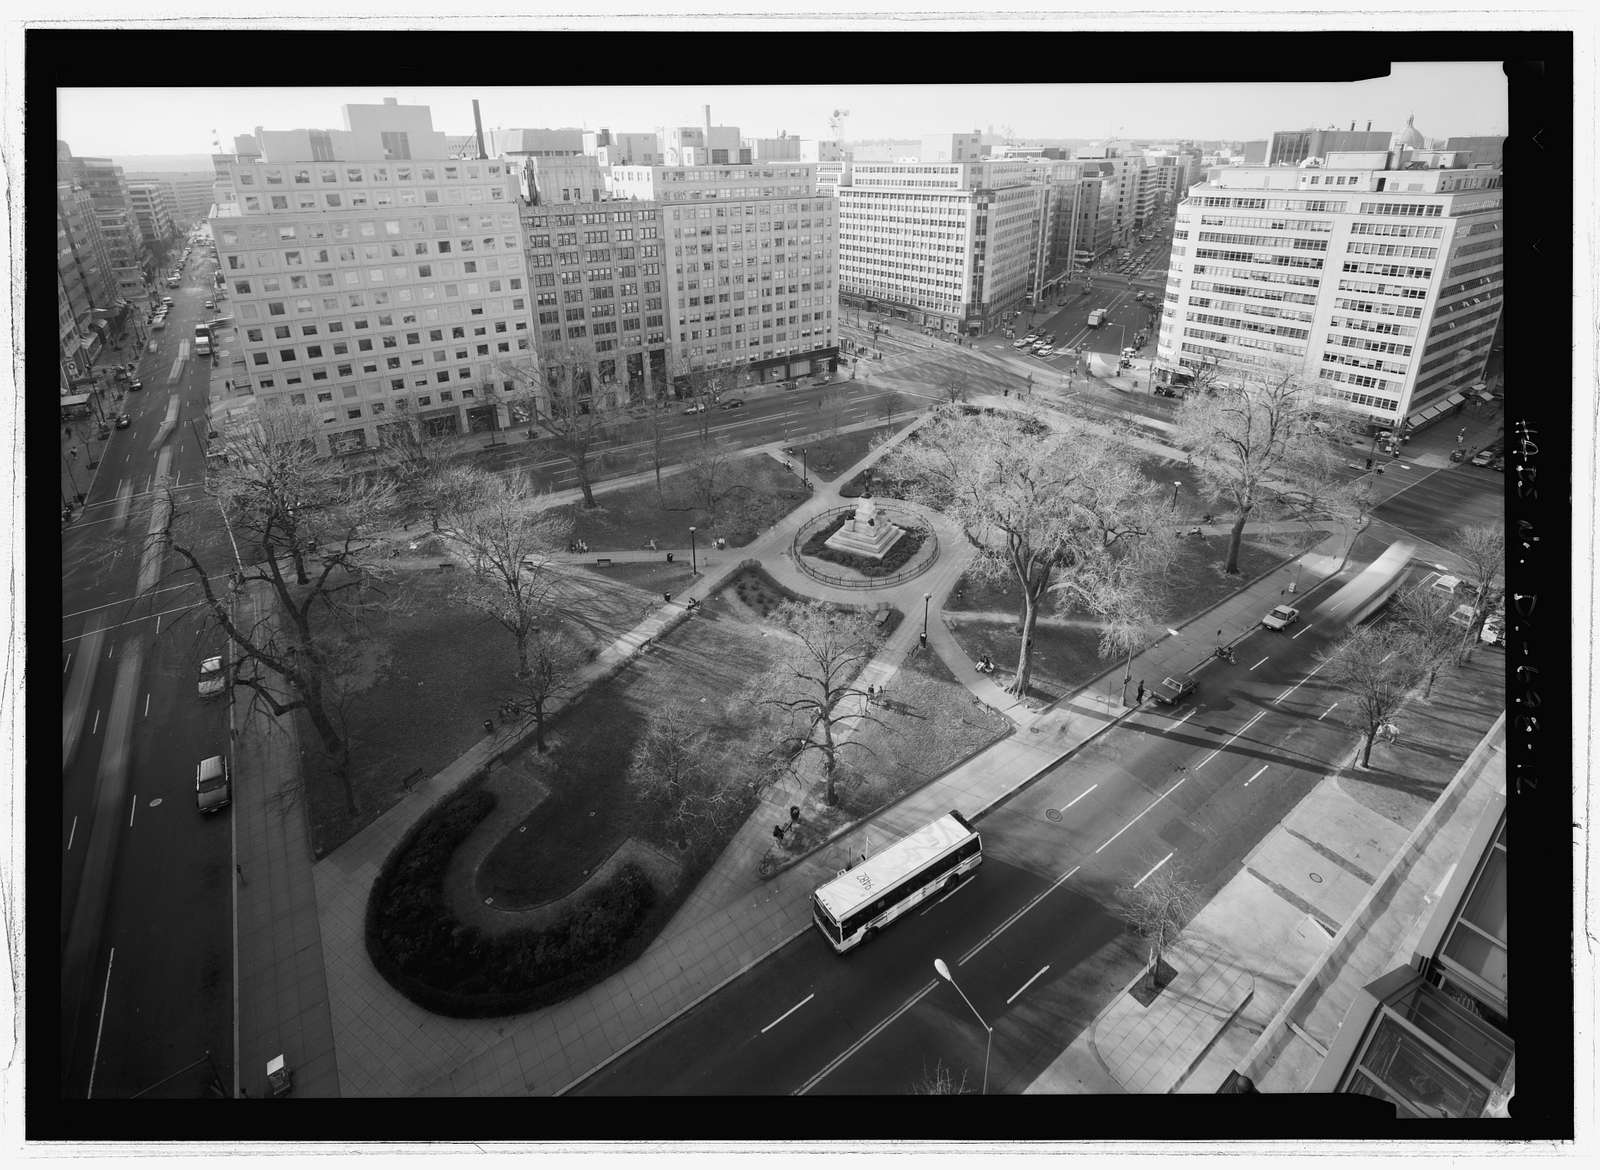 Connecticut Avenue, Washington, District of Columbia, DC